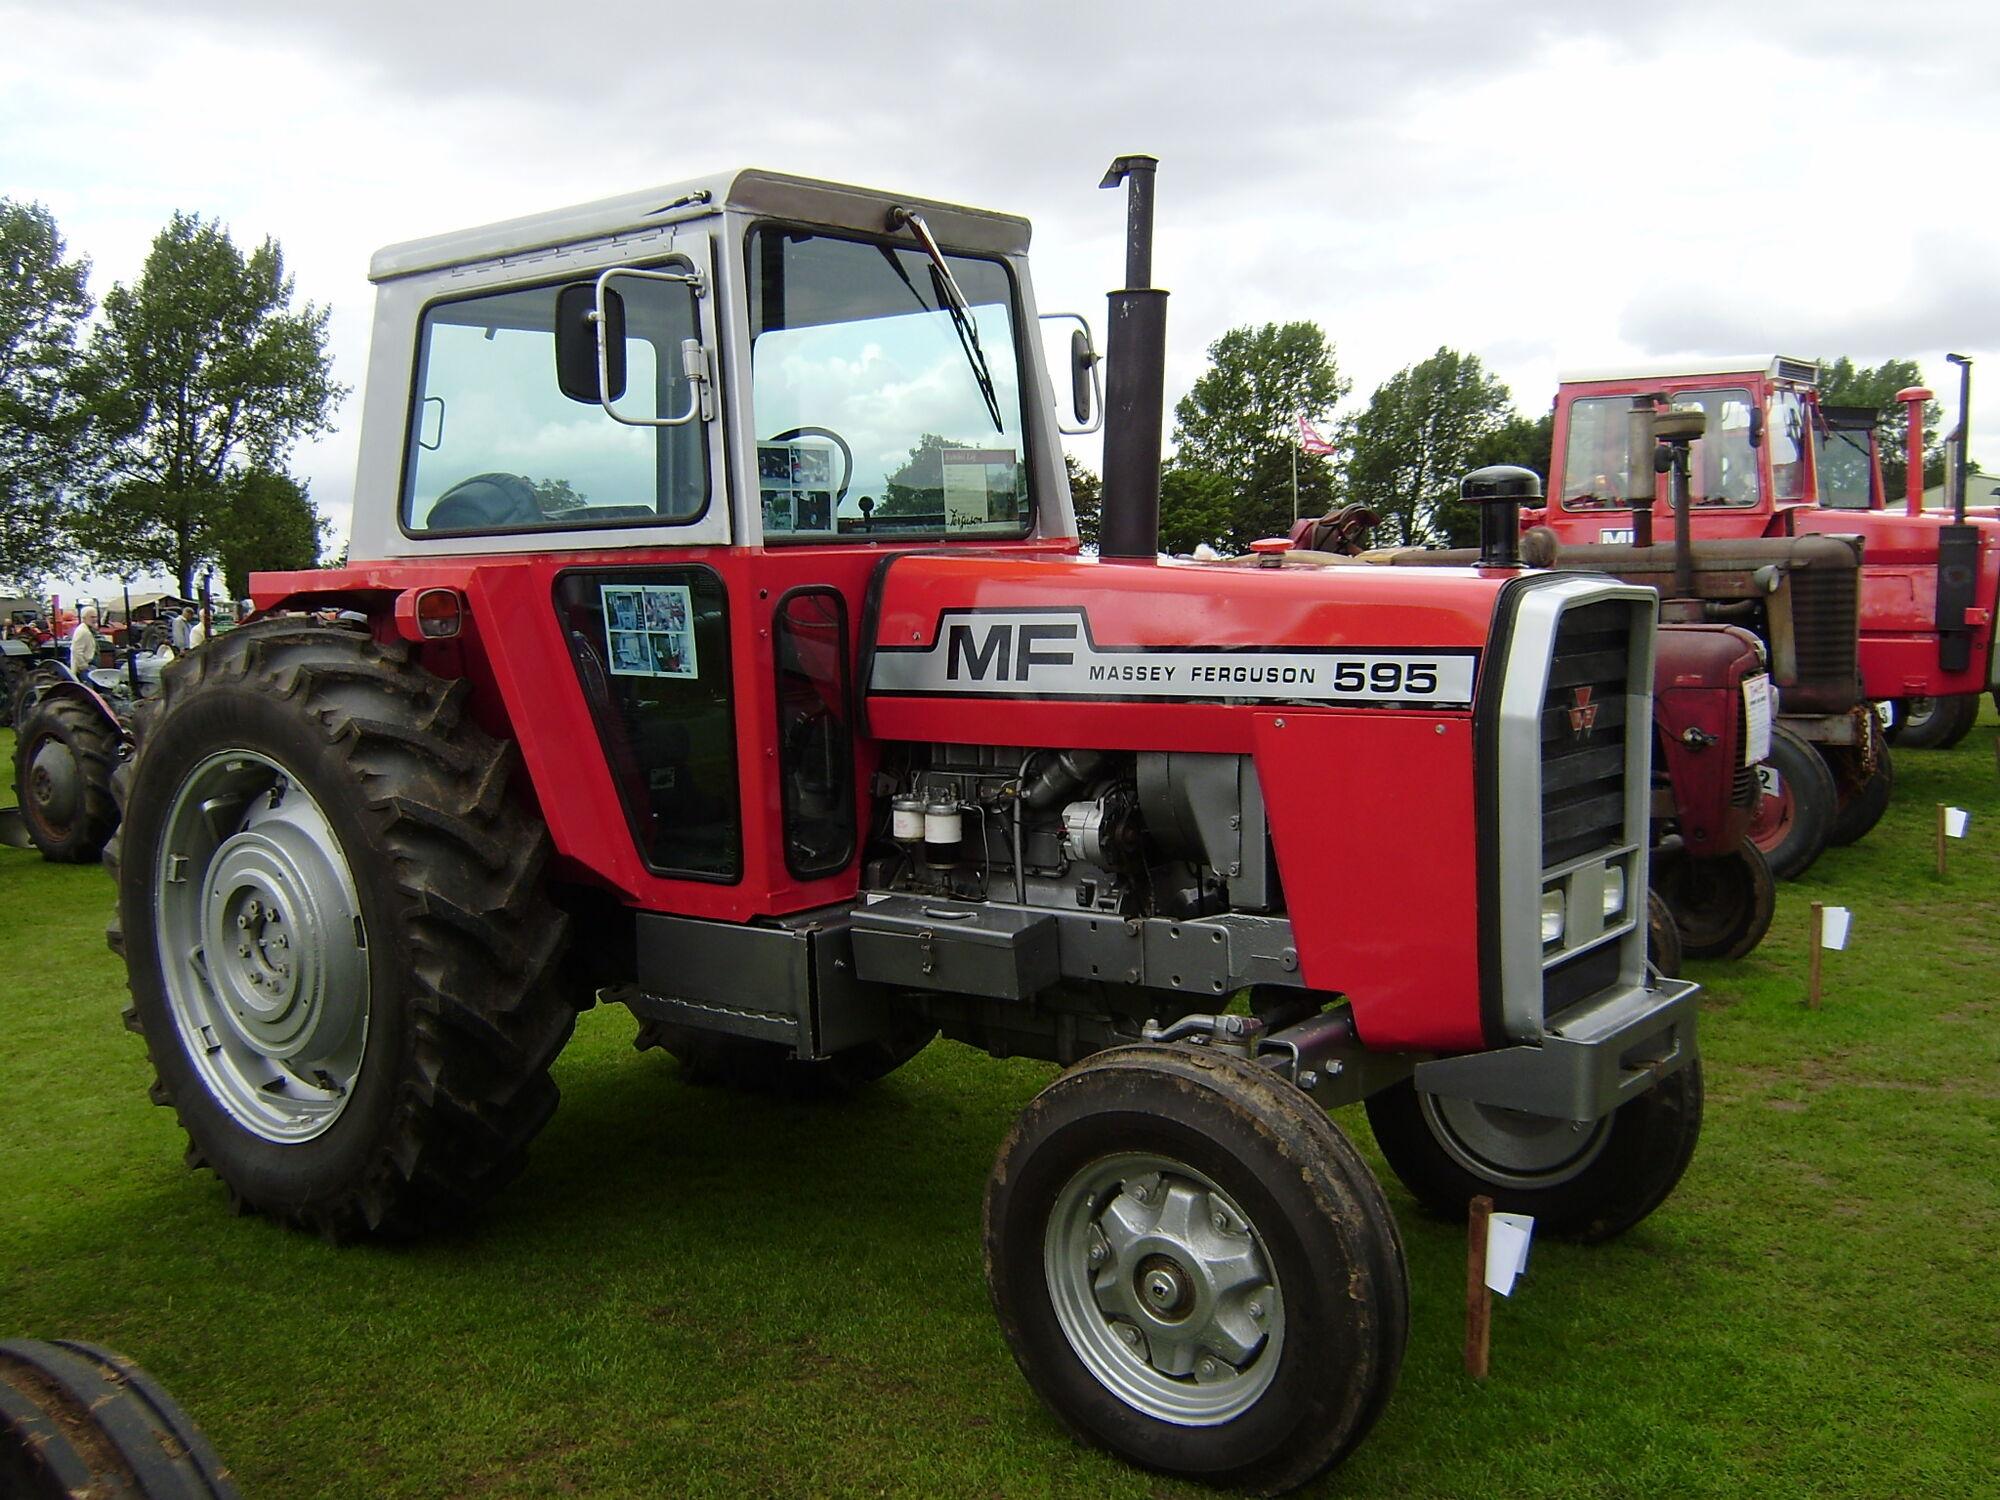 Massey Ferguson 595 Tractor Amp Construction Plant Wiki